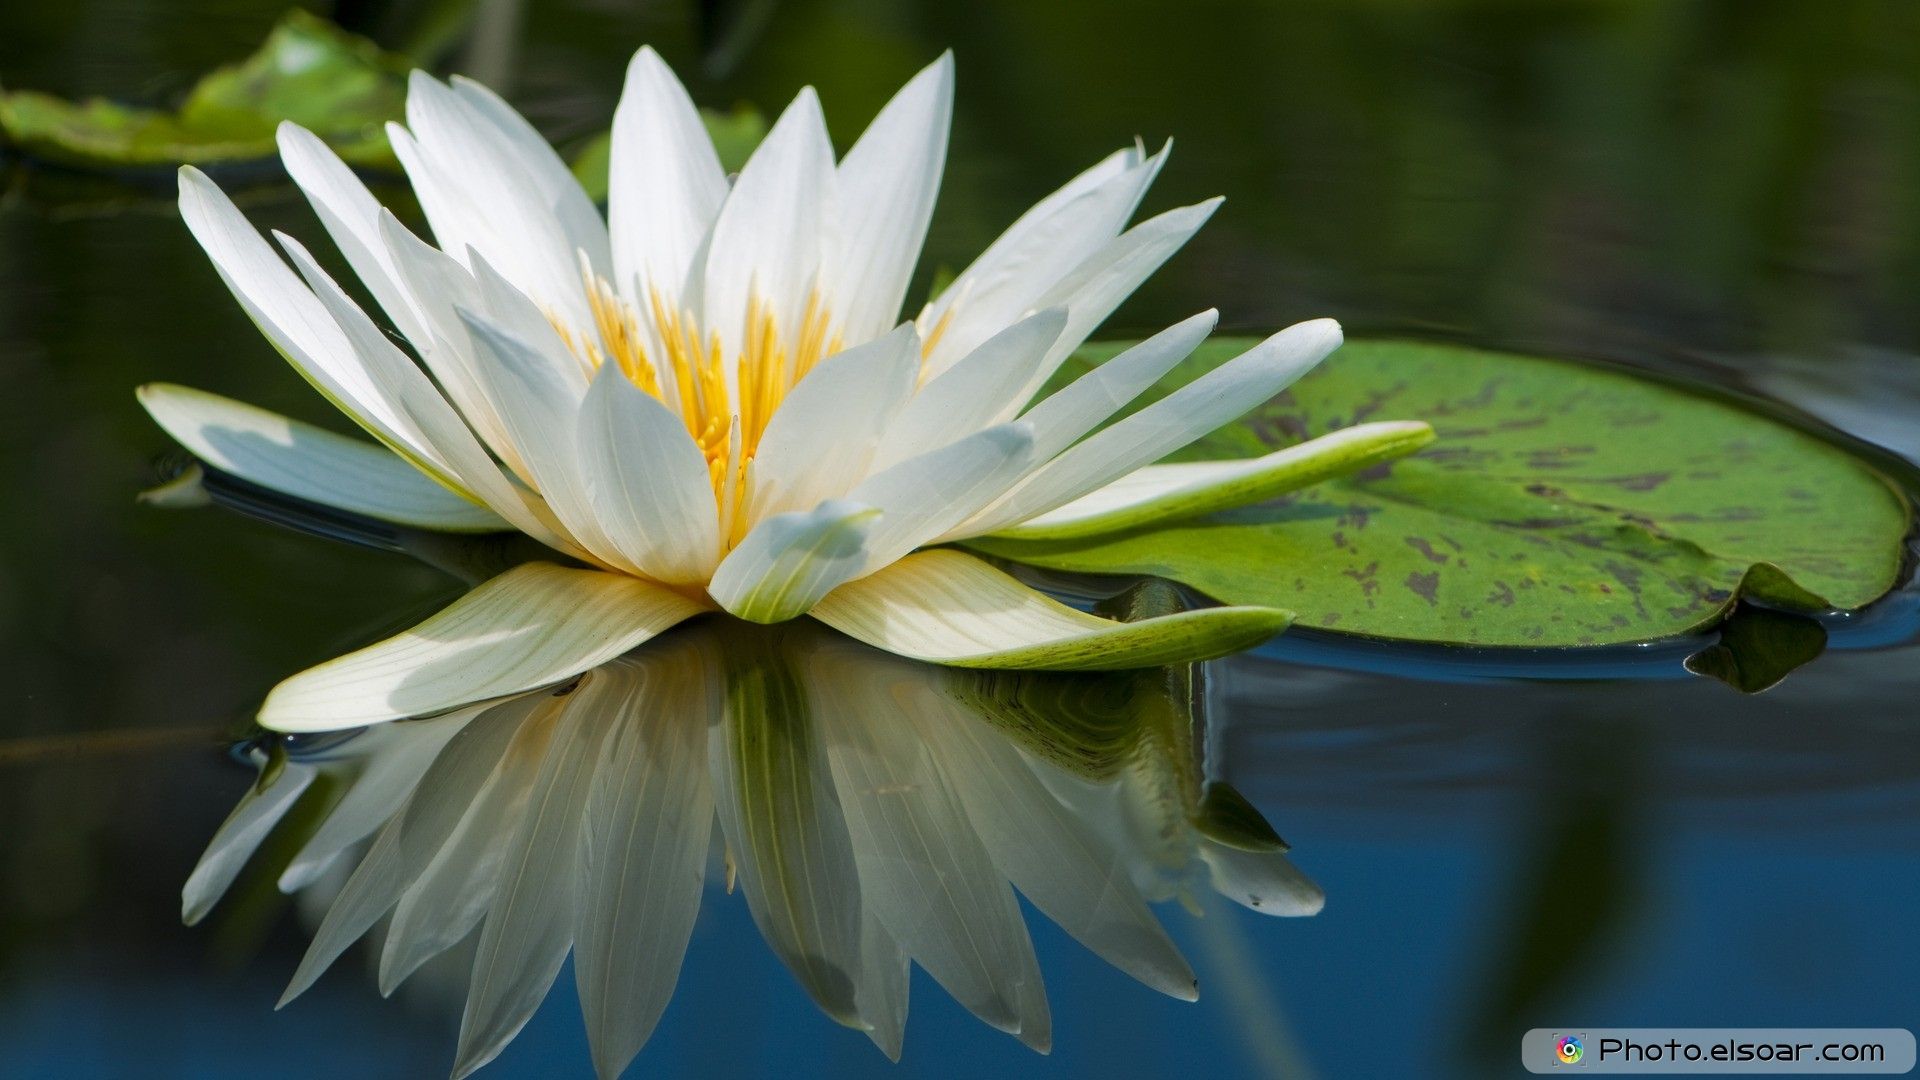 10 most beautiful flowers images download beautiful flowers desktop wallpapers for widescreen izmirmasajfo